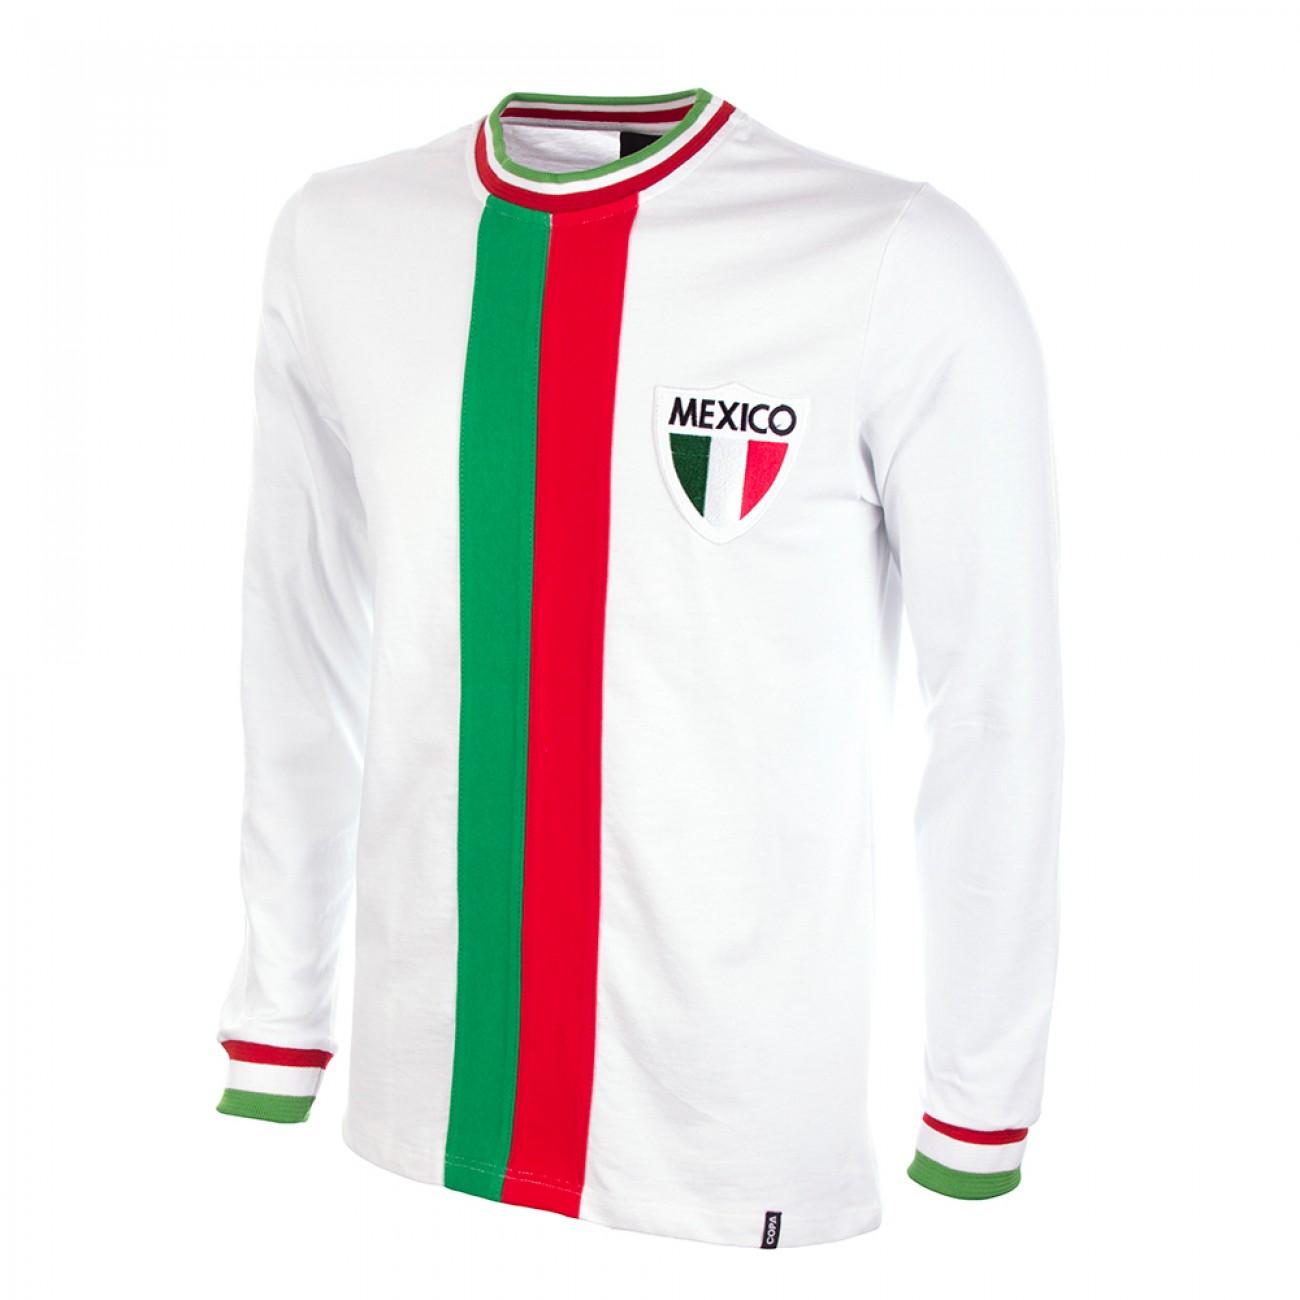 http://www.retrofootball.es/ropa-de-futbol/camiseta-mexico-2-equipacion-1978.html